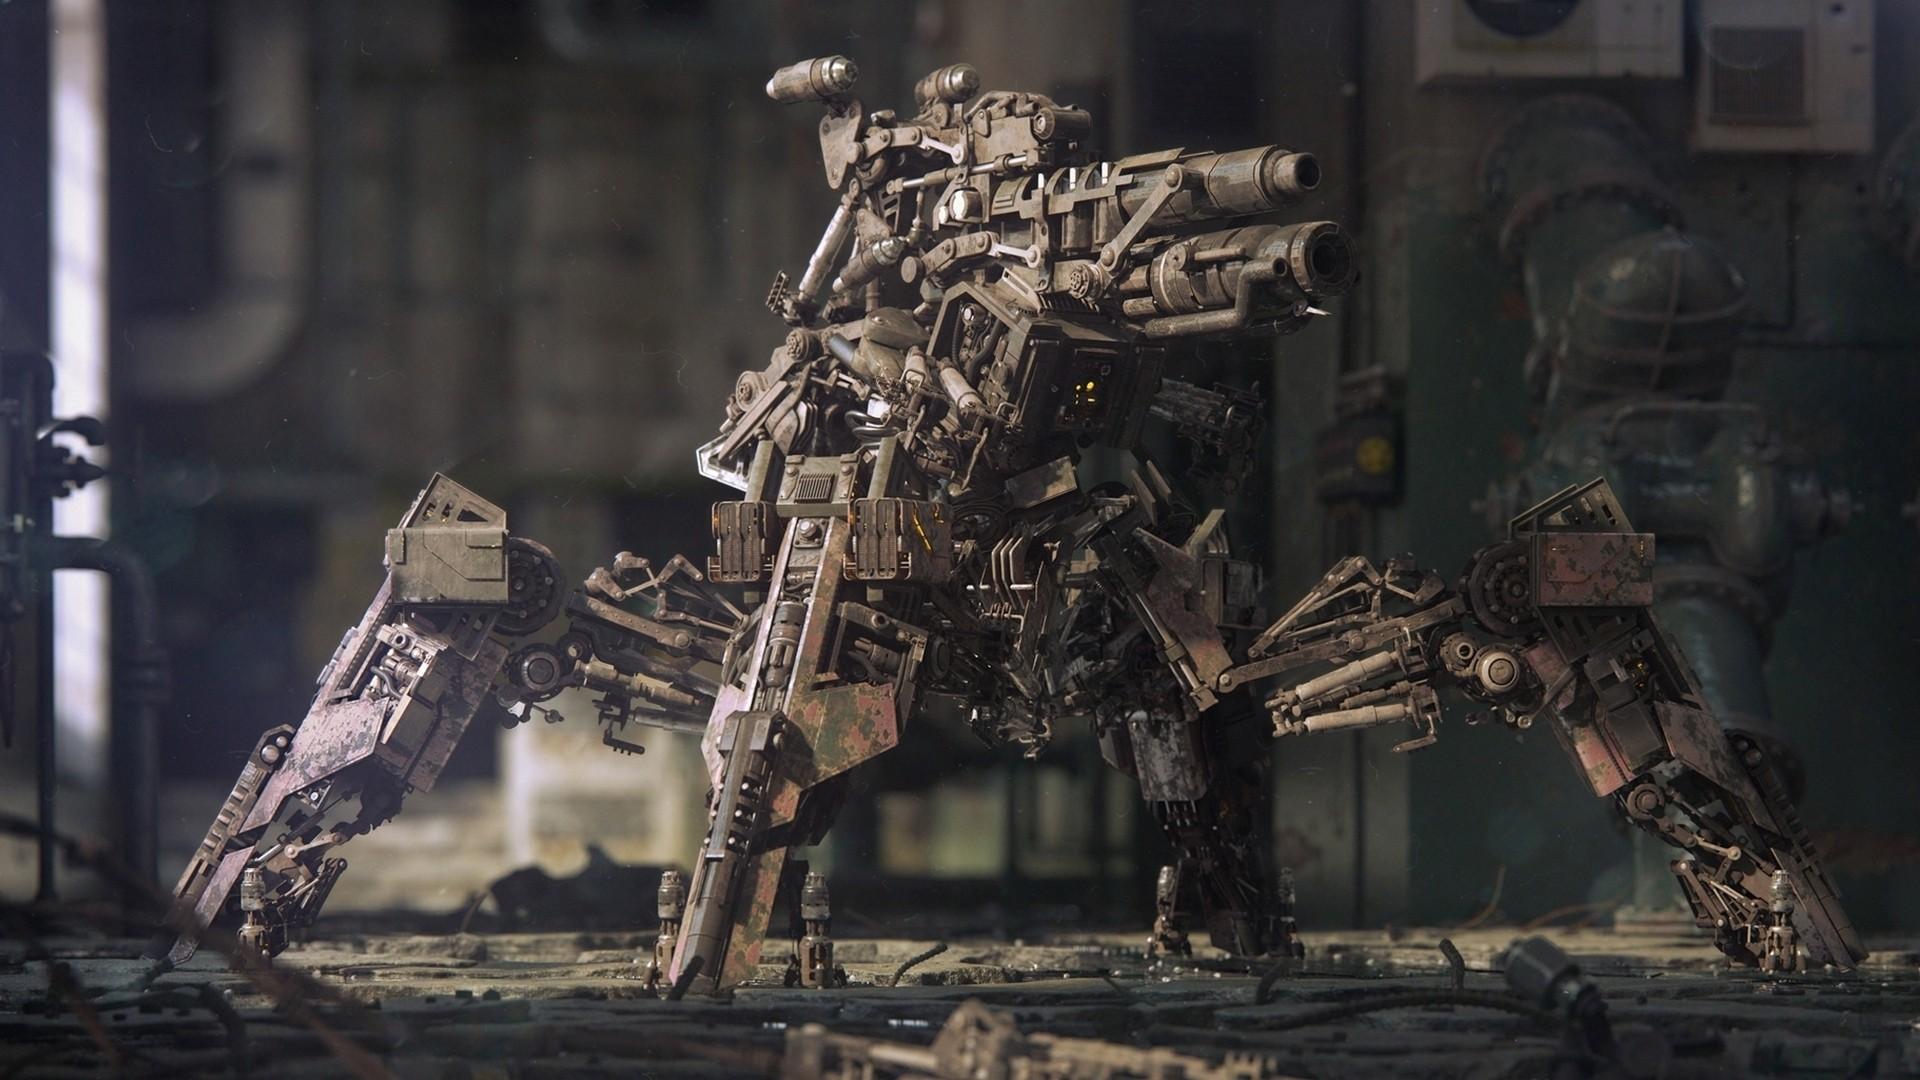 General 1920x1080 digital art cannons military mech artwork weapon concept art robot machine